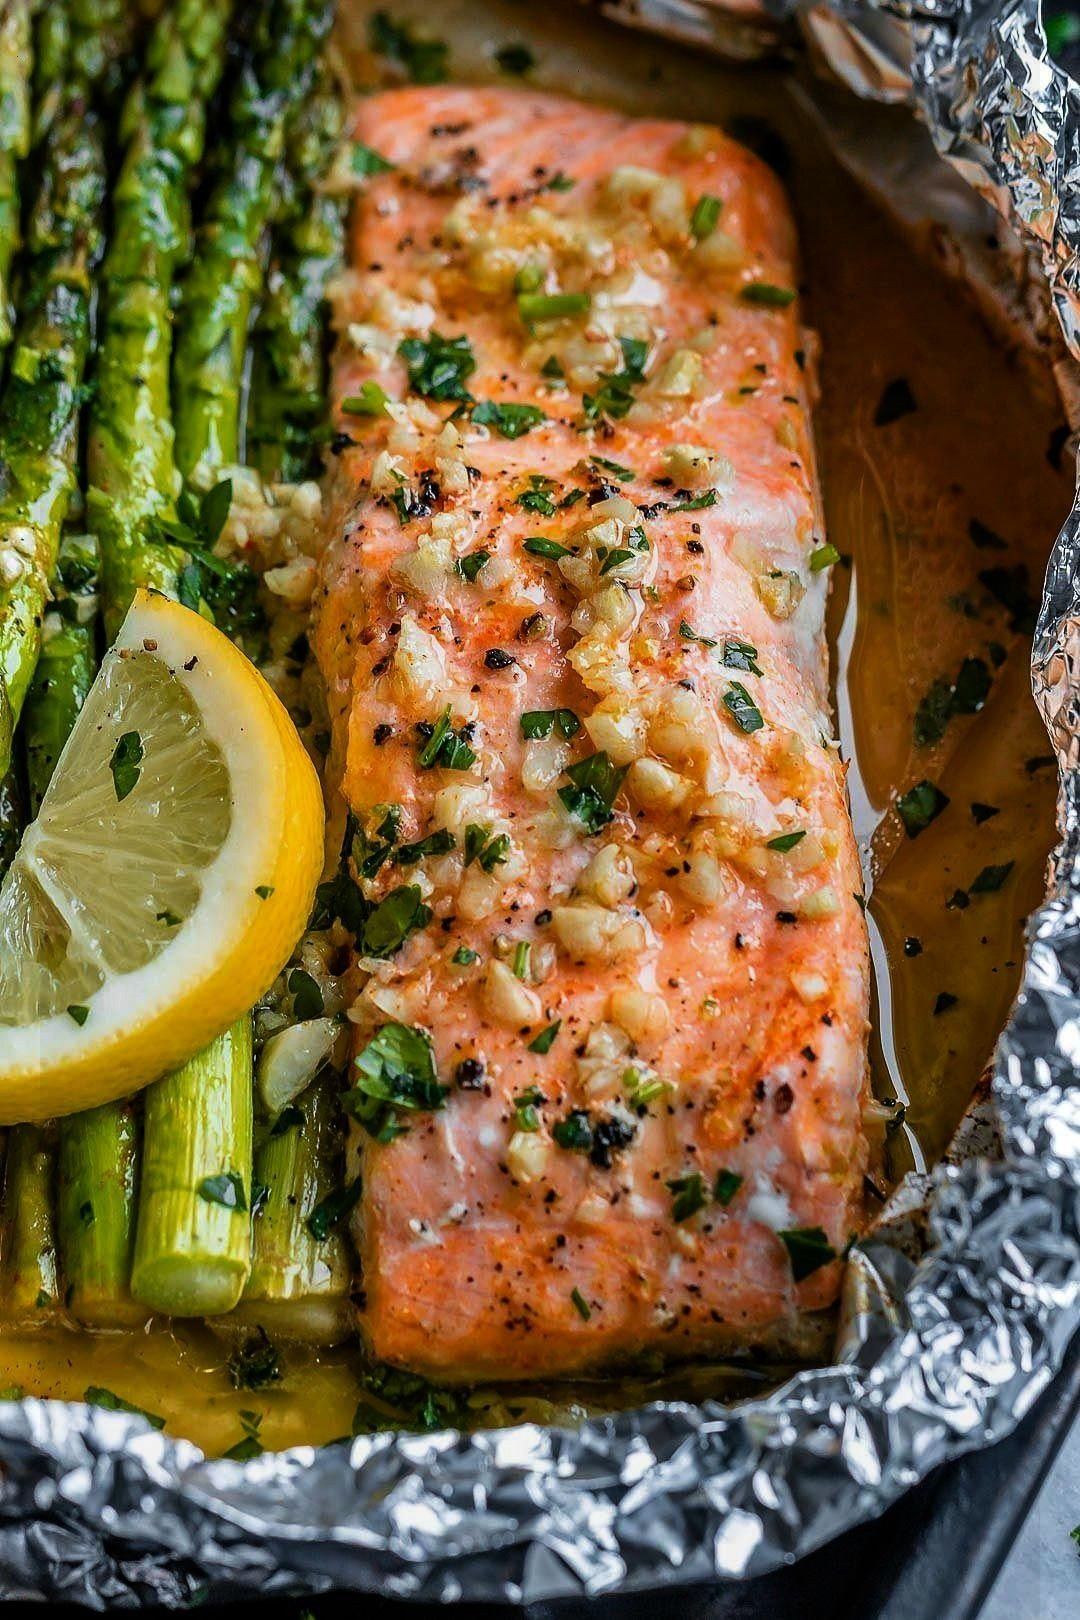 and Asparagus Foil Packs with Garlic Lemon Butter Sauce - My Blog - -Salmon and Asparagus Foil Pack